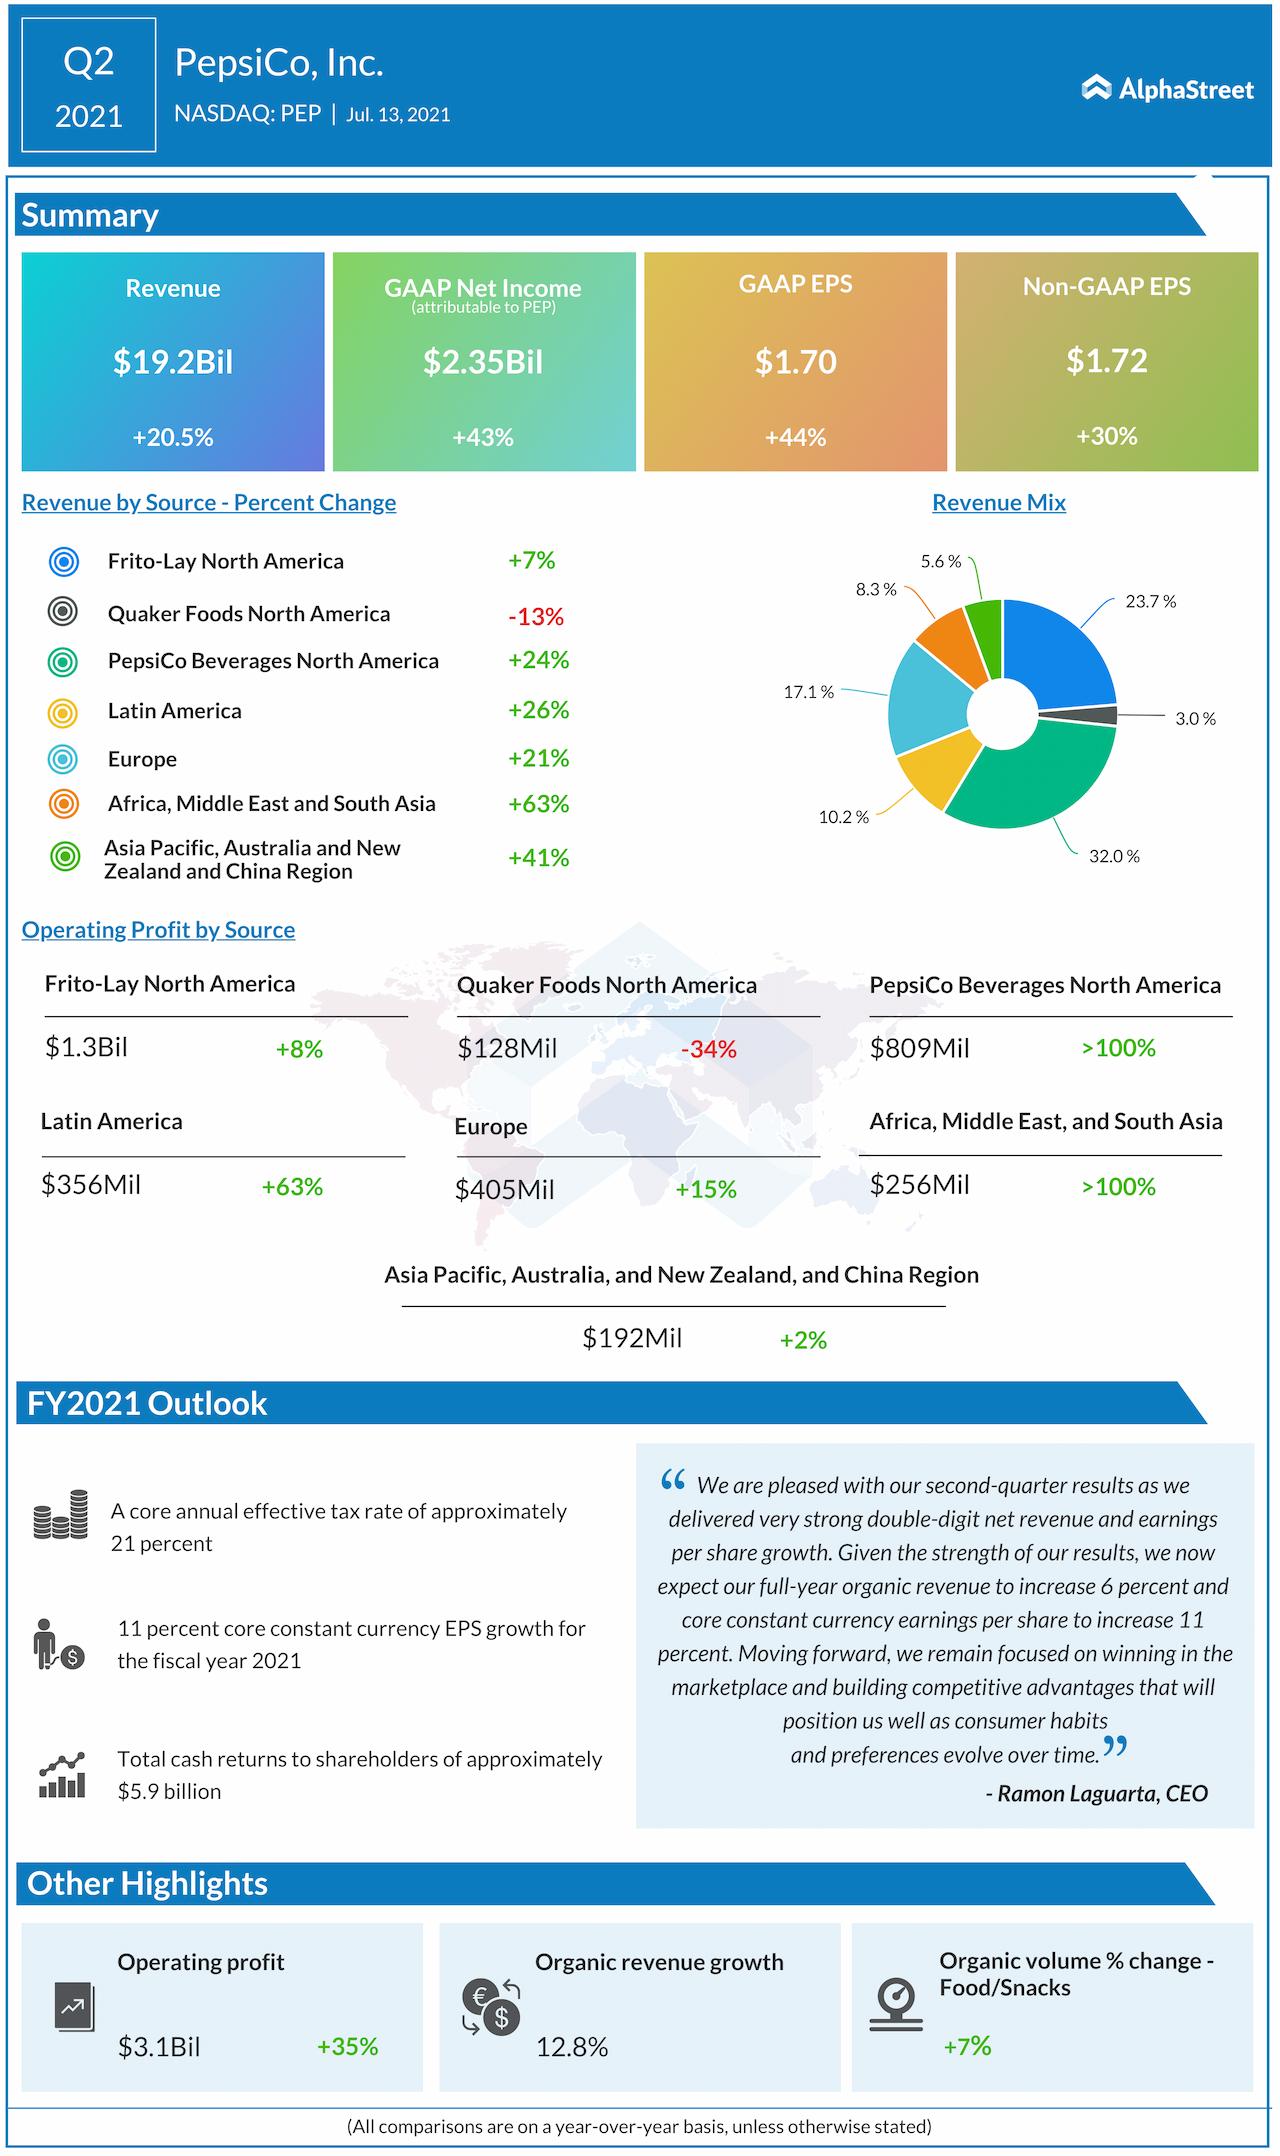 PepsiCo Q2 2021 earnings infographic